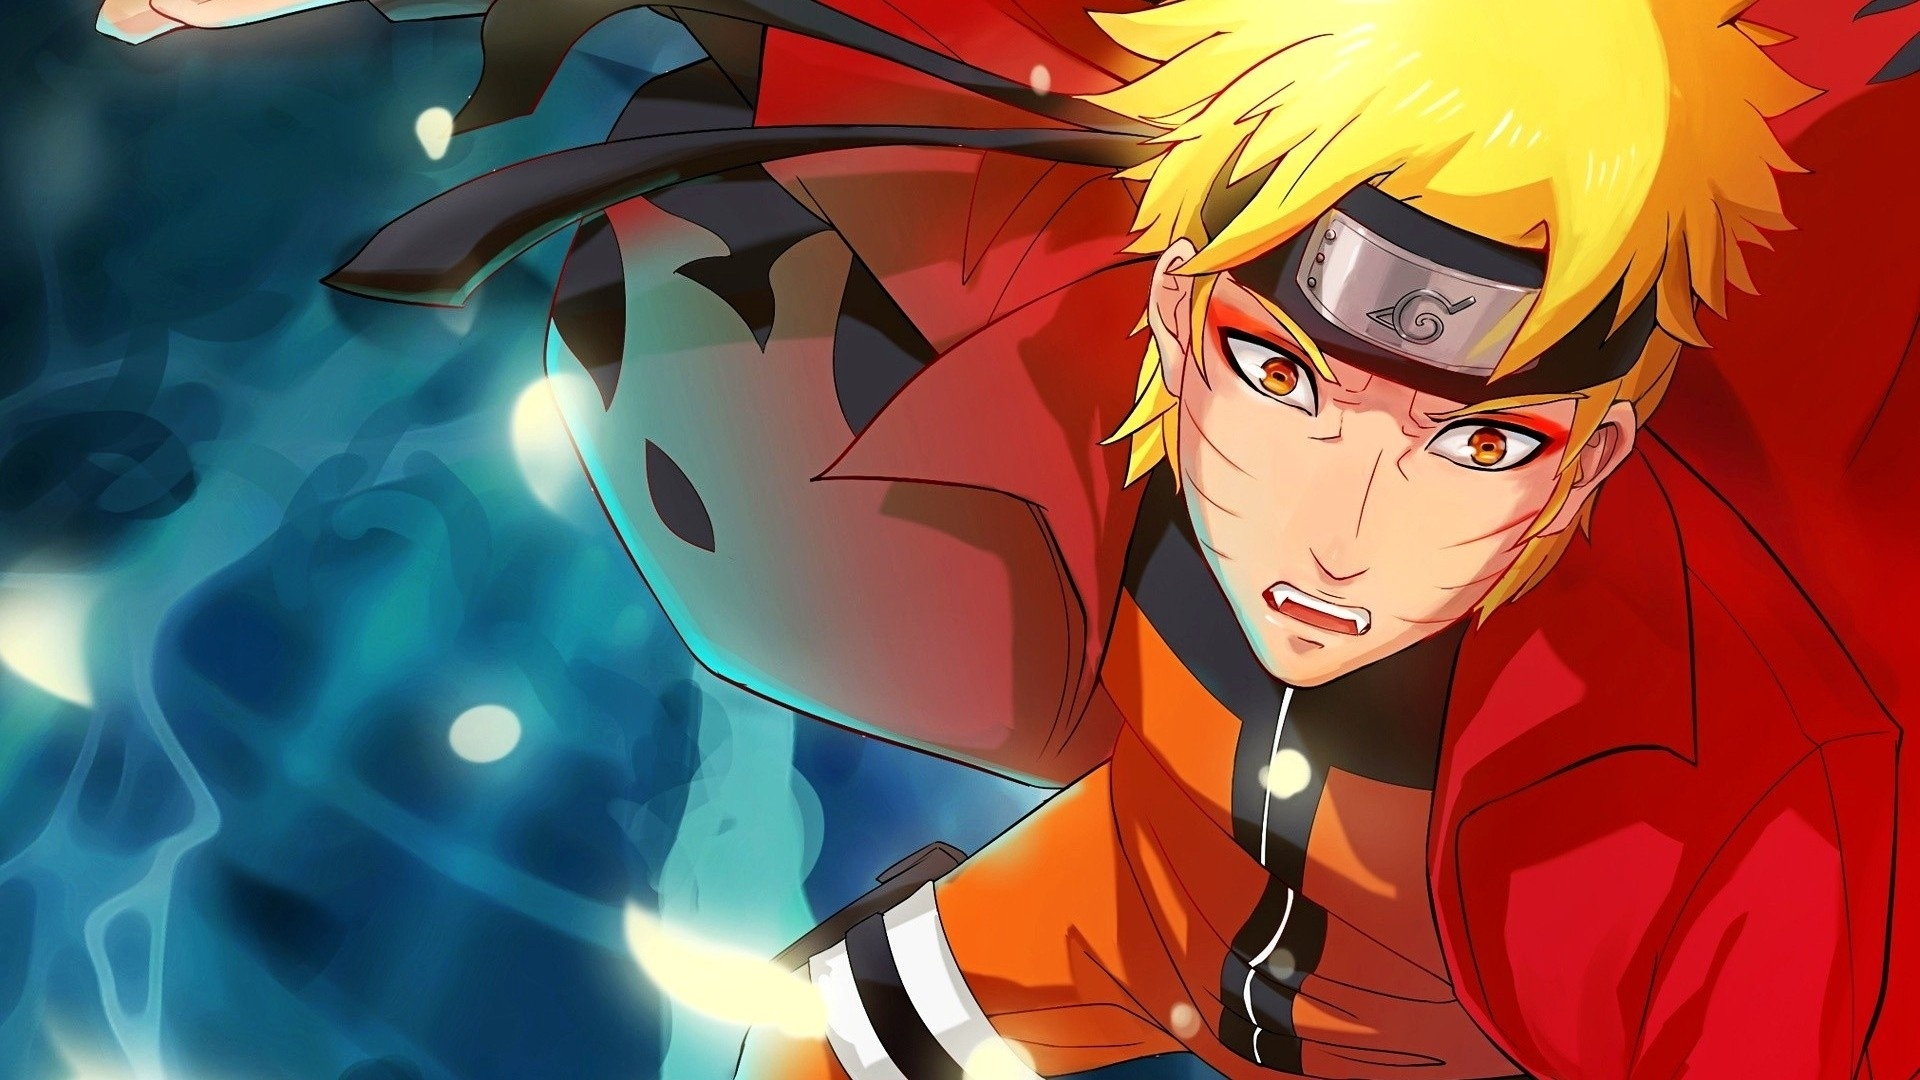 Naruto Shippuden Wallpaper Free Download background wallpaper